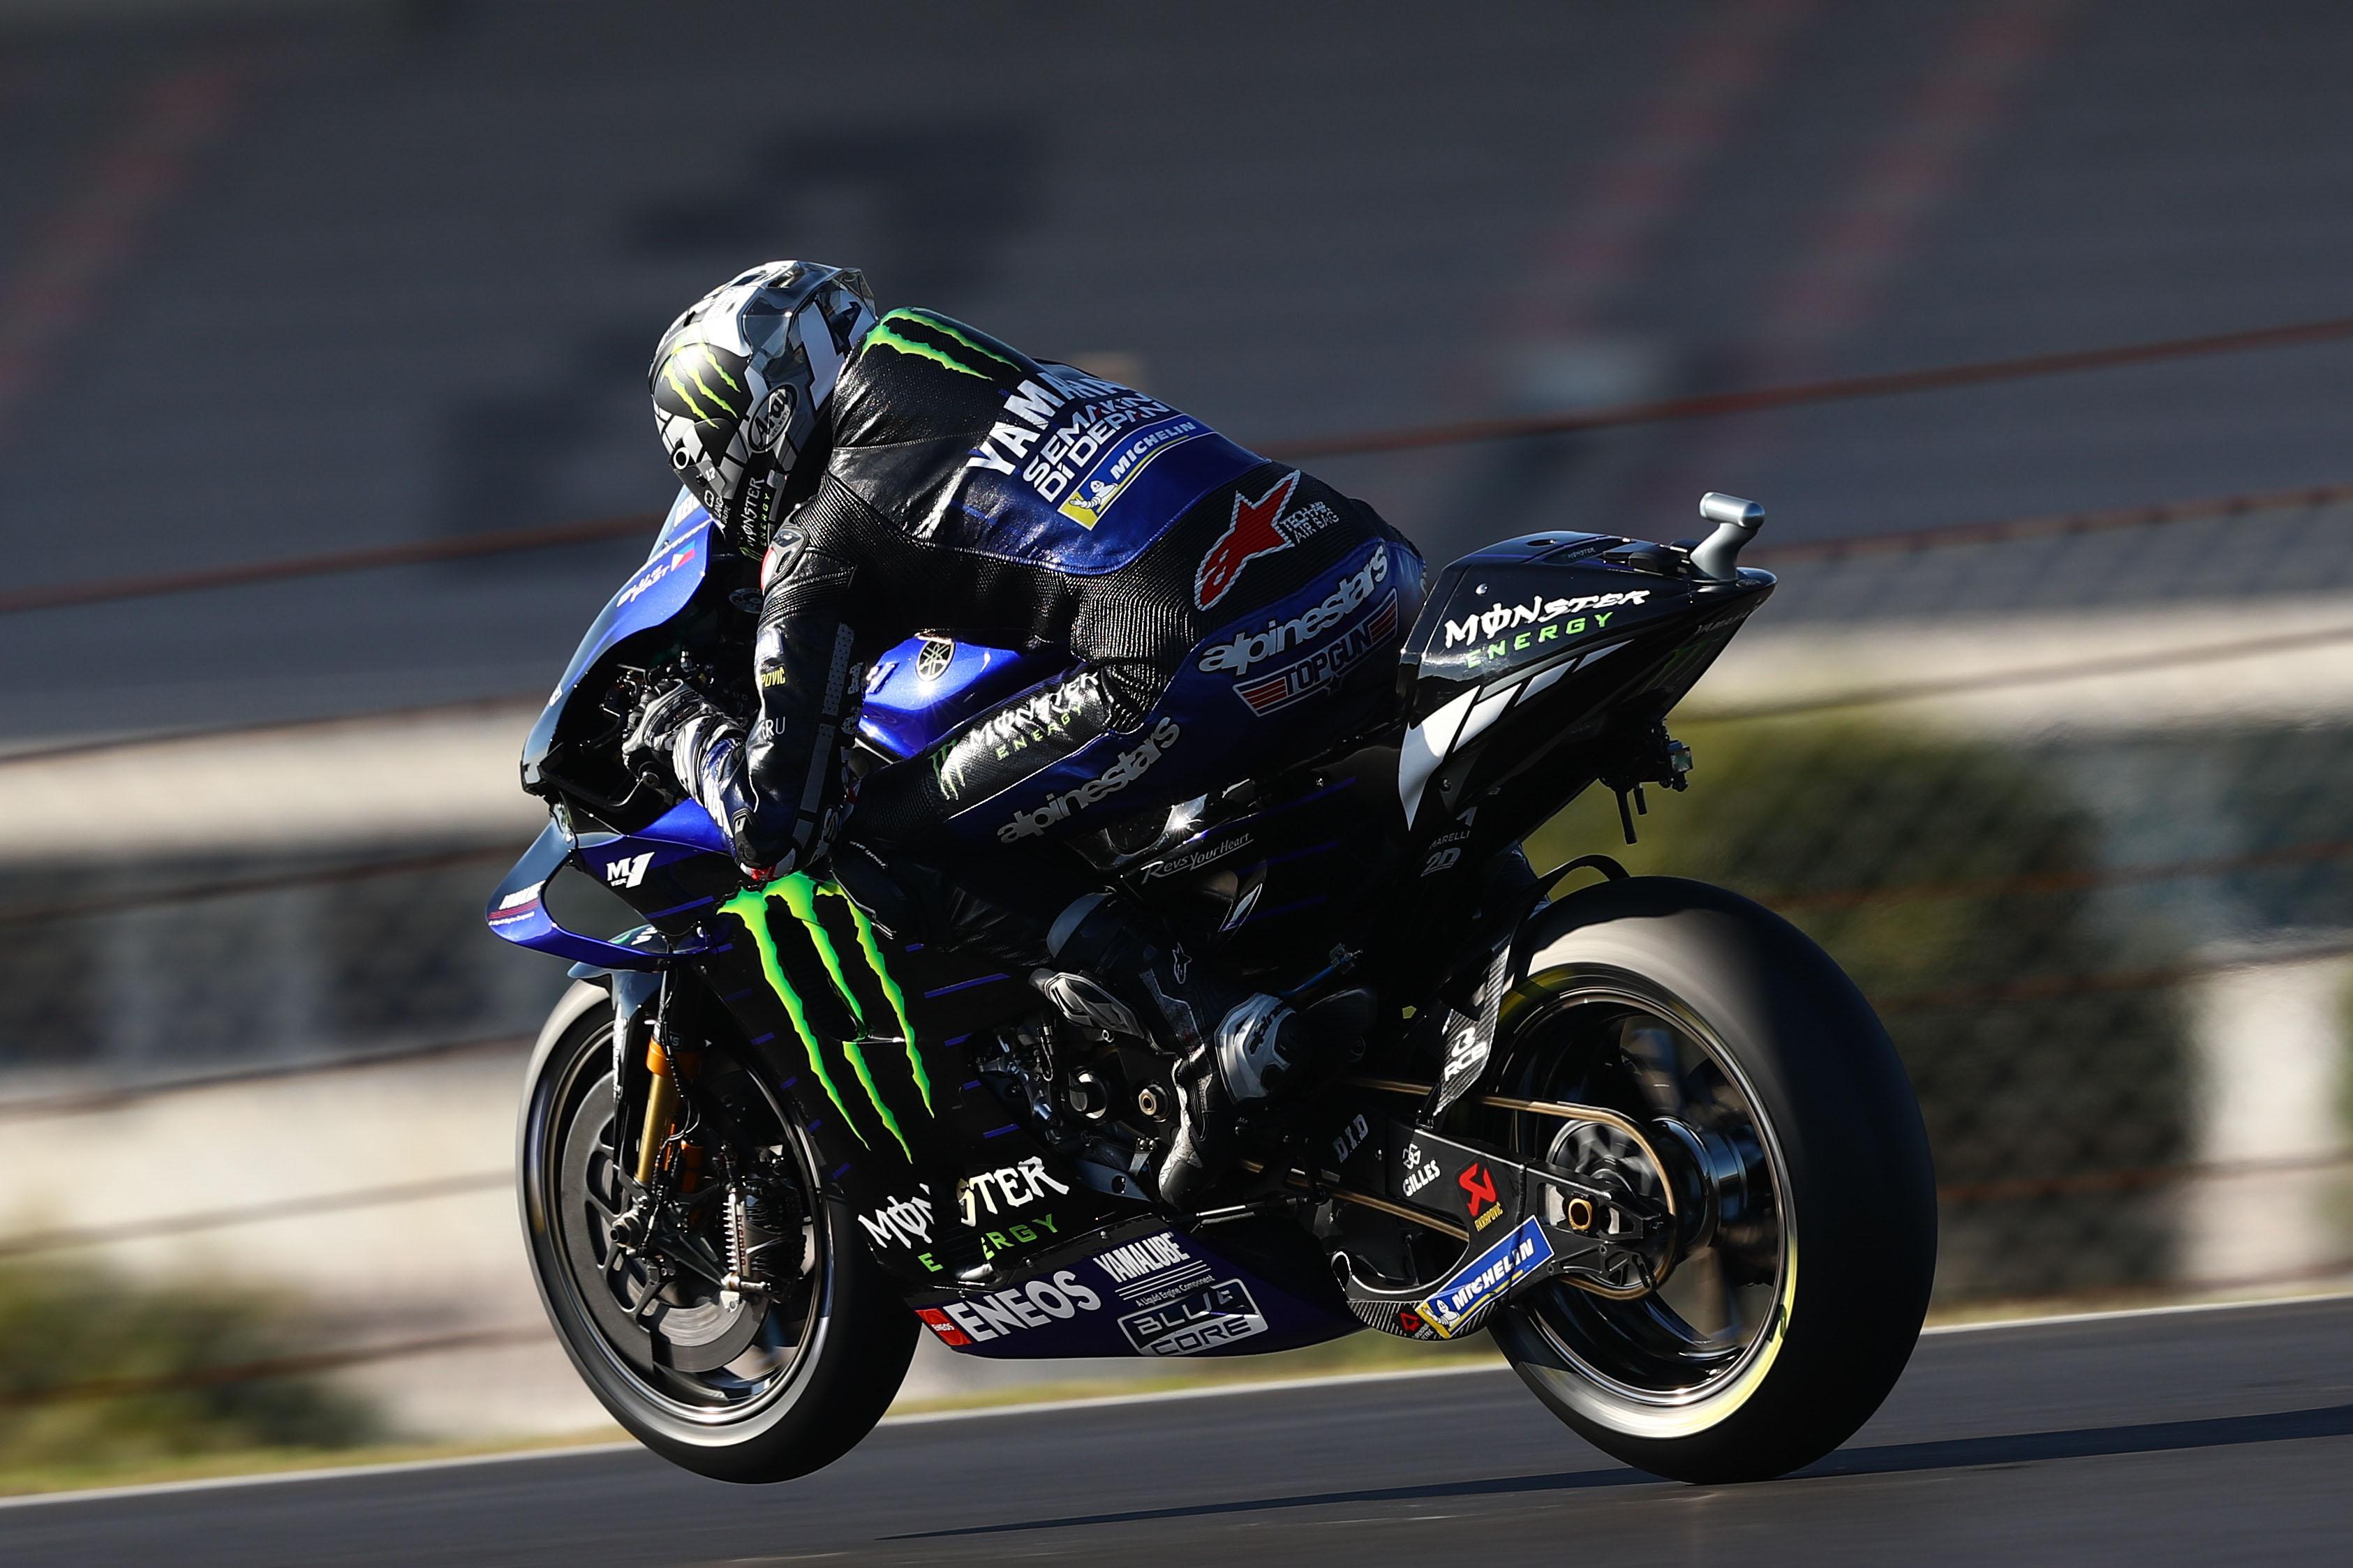 Maverick Vinales, Yamaha, MotoGP, Portimao